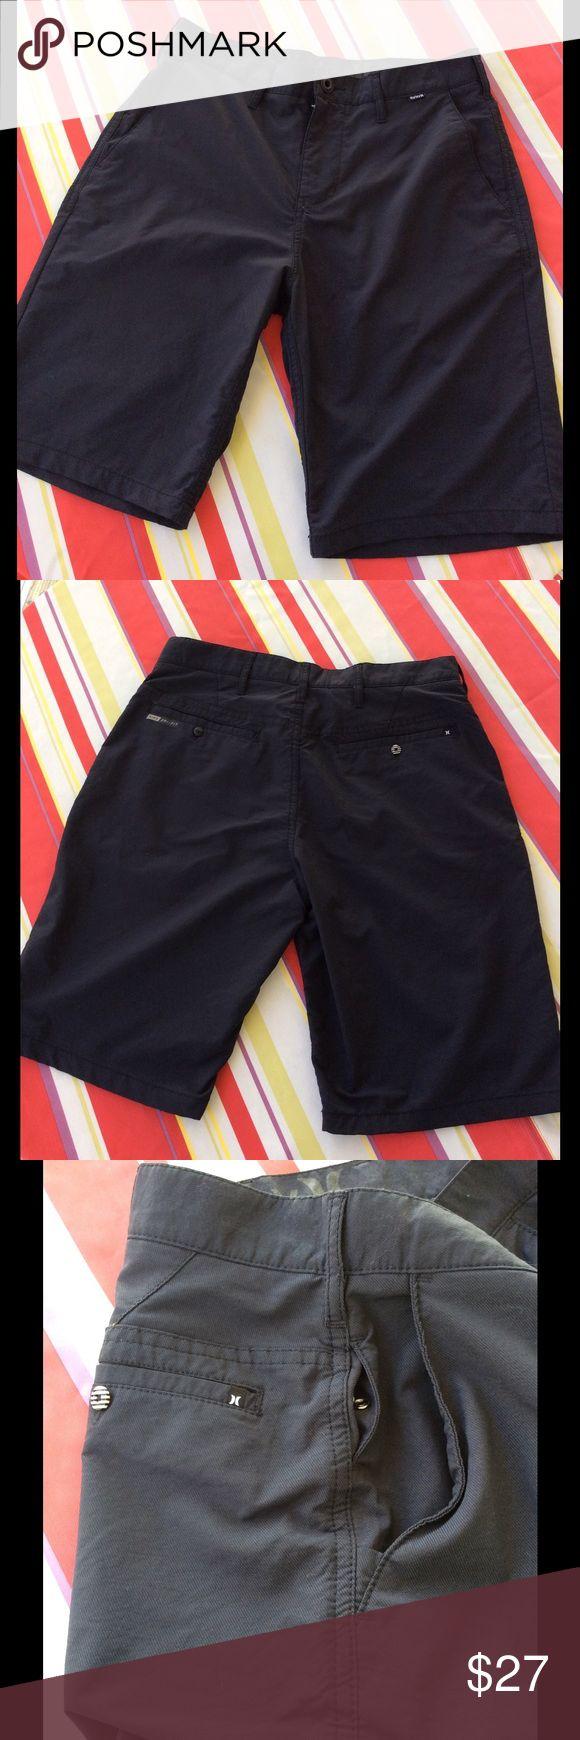 "Men's Hurley/Nike Dri-Fit Shorts EUC Secret key pocket, as shown in pix #3; 2 deep mesh front pockets and 2 mesh back.  Great cool shorts!  Measurements:  29"" waist; 10"" rise and 10"" inseam Hurley/Nike Dri-Fit Shorts"